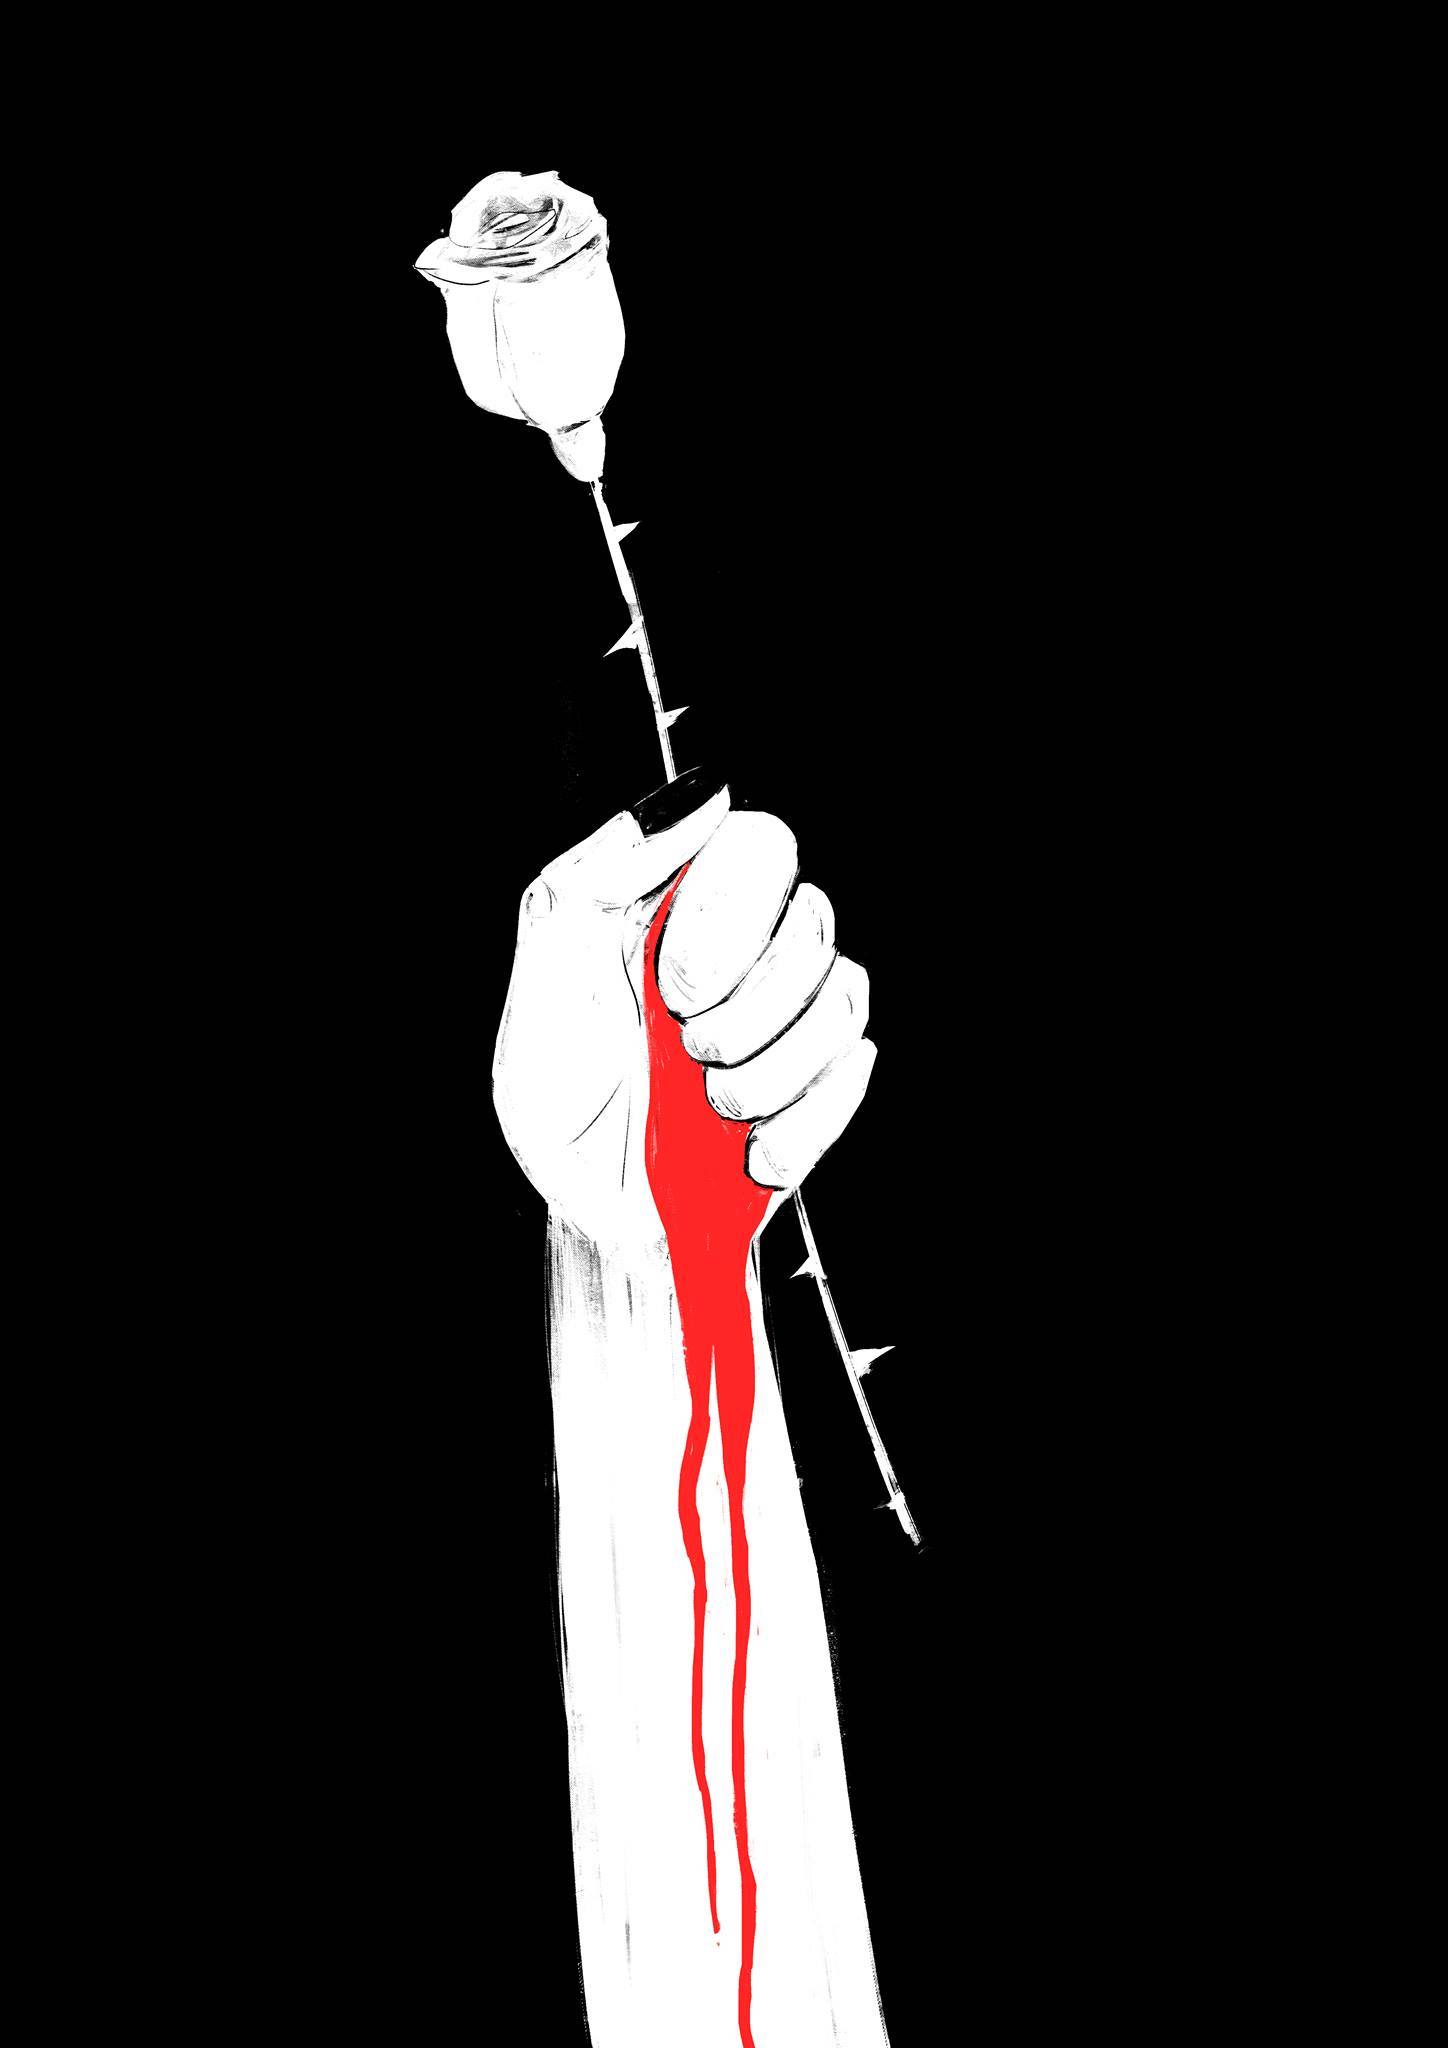 Плакат беларуской художницы и авторки телеграм-канала «Не благодари» Дарьи Сазанович (https://sheeborshee.com/)